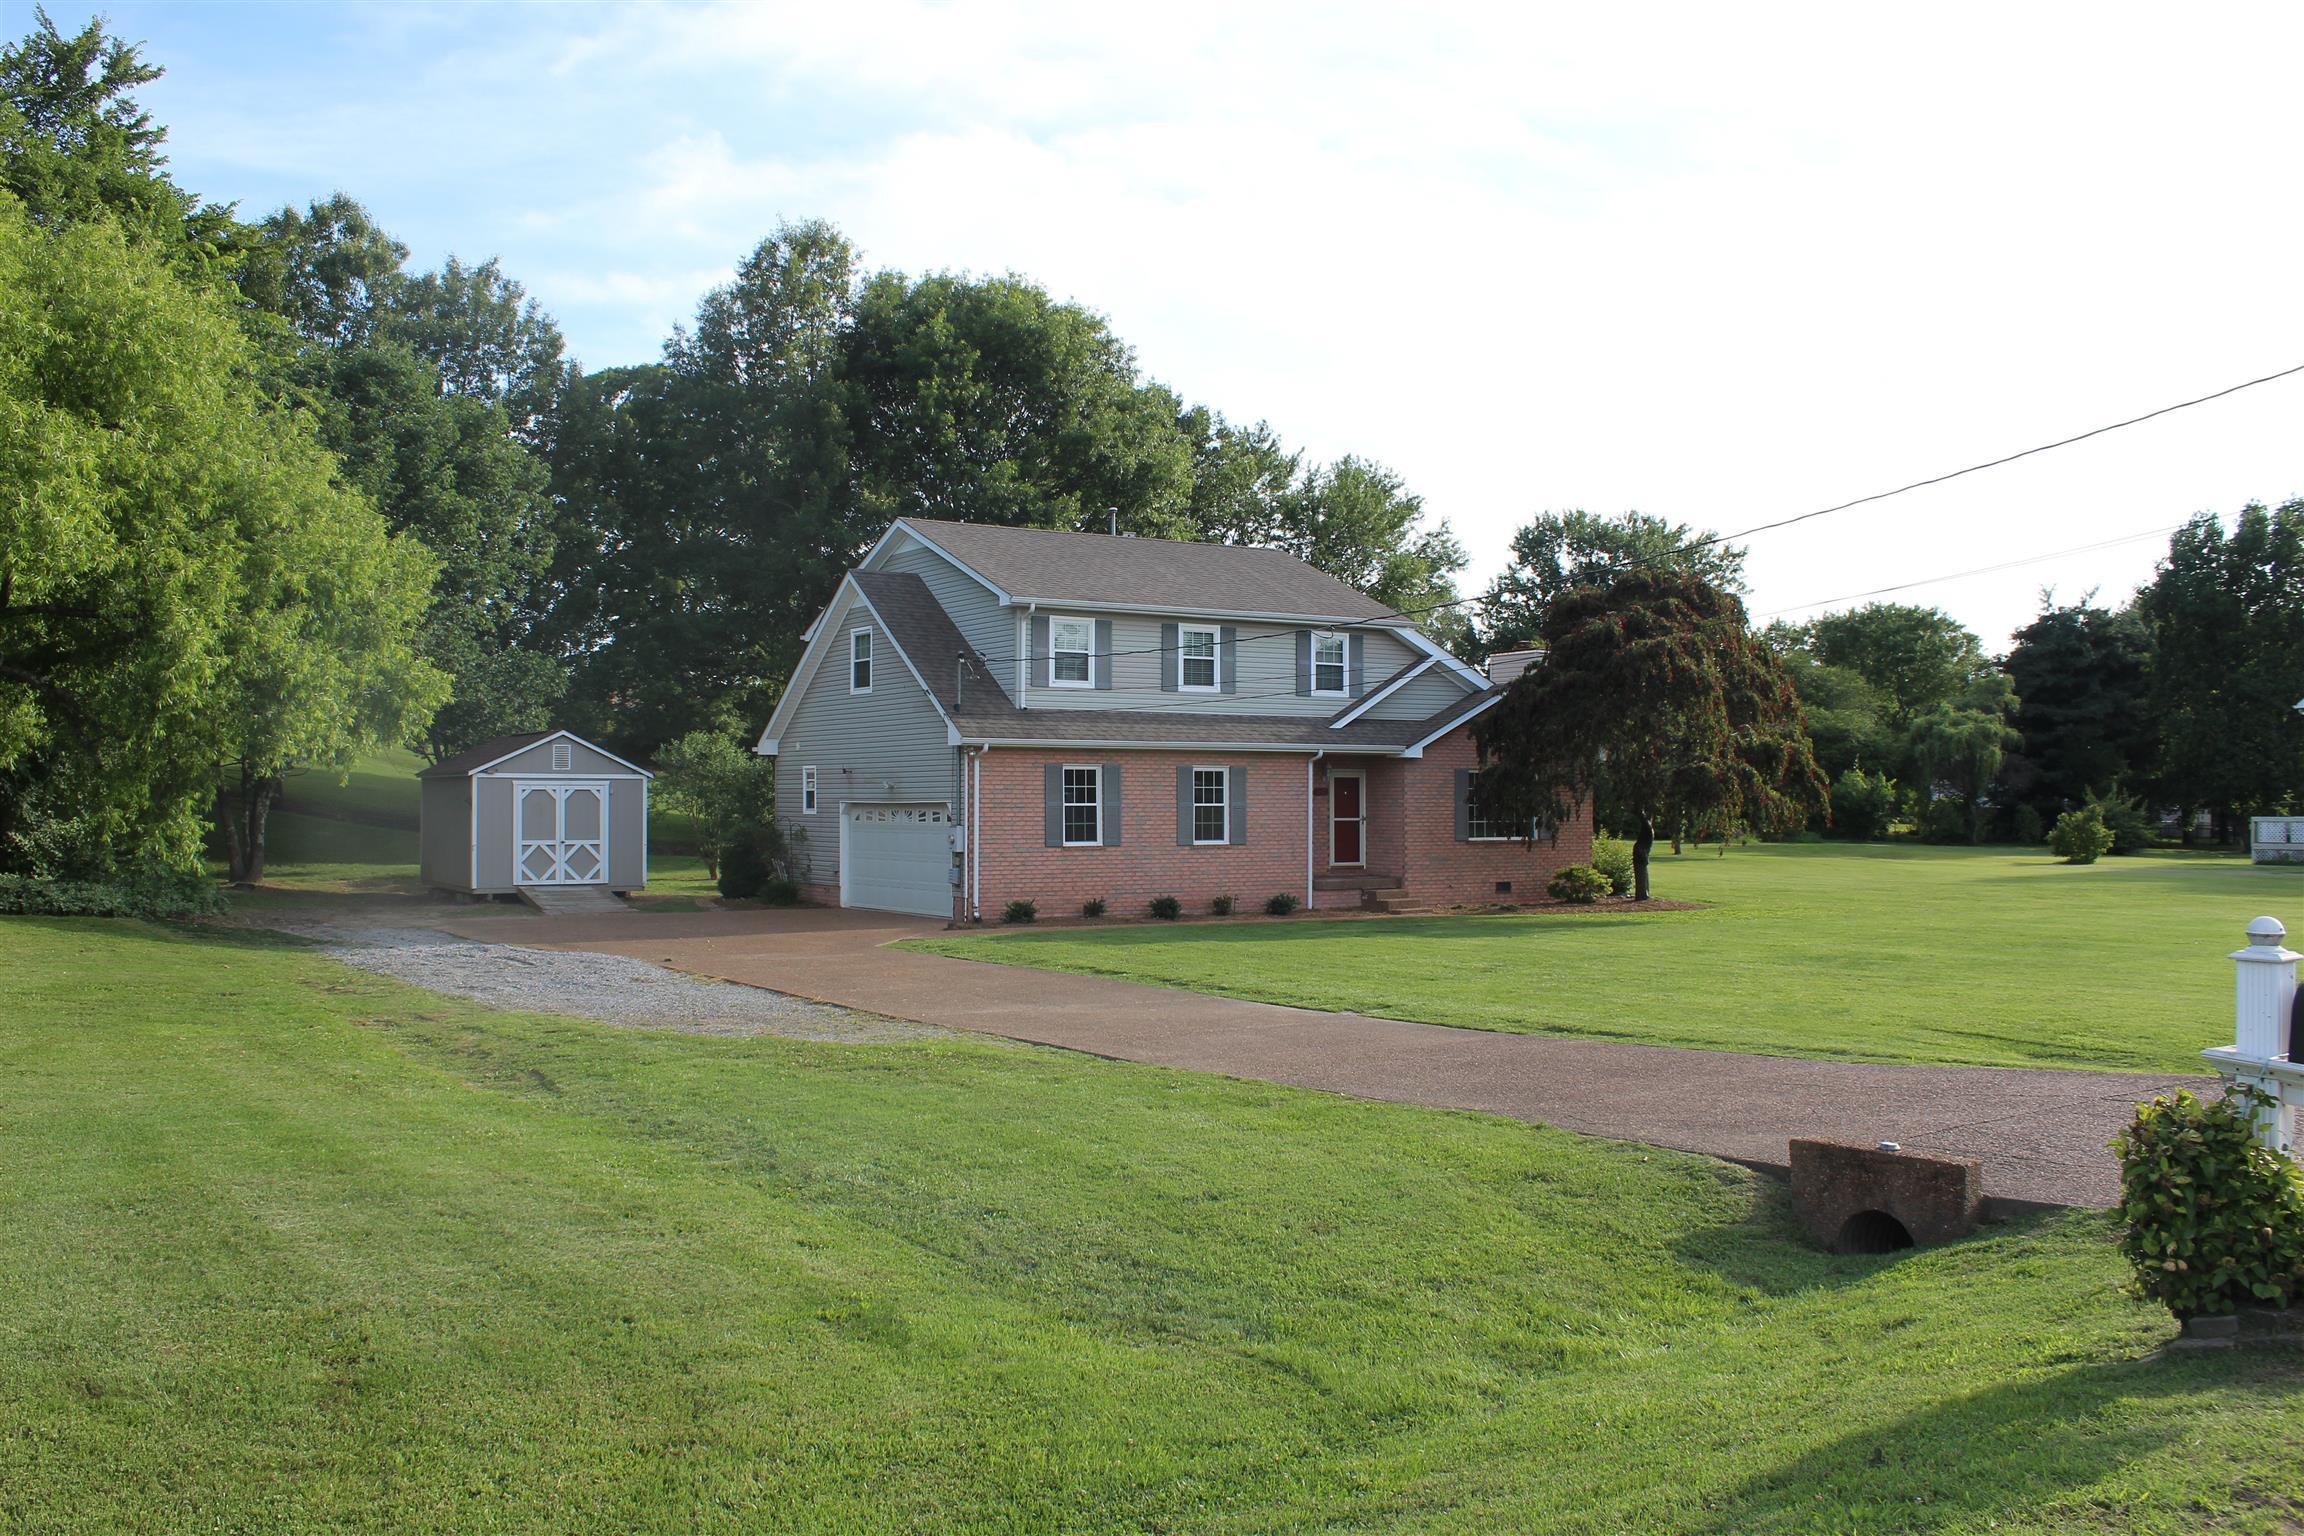 507 Bent Tree Dr, Pegram, TN 37143 - Pegram, TN real estate listing